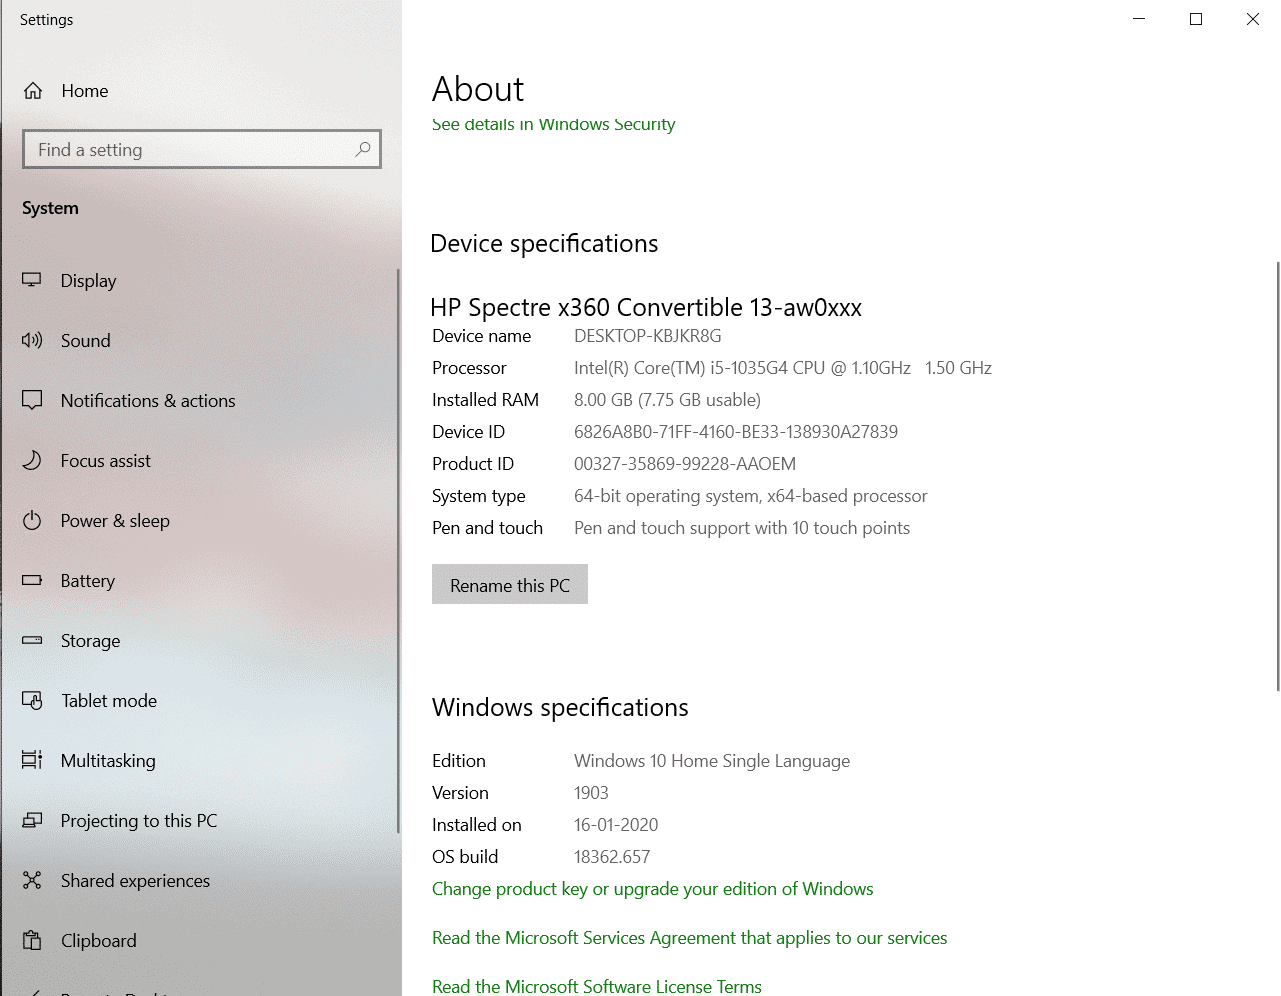 Hoeveel RAM heb je op je Windows 10-apparaat?